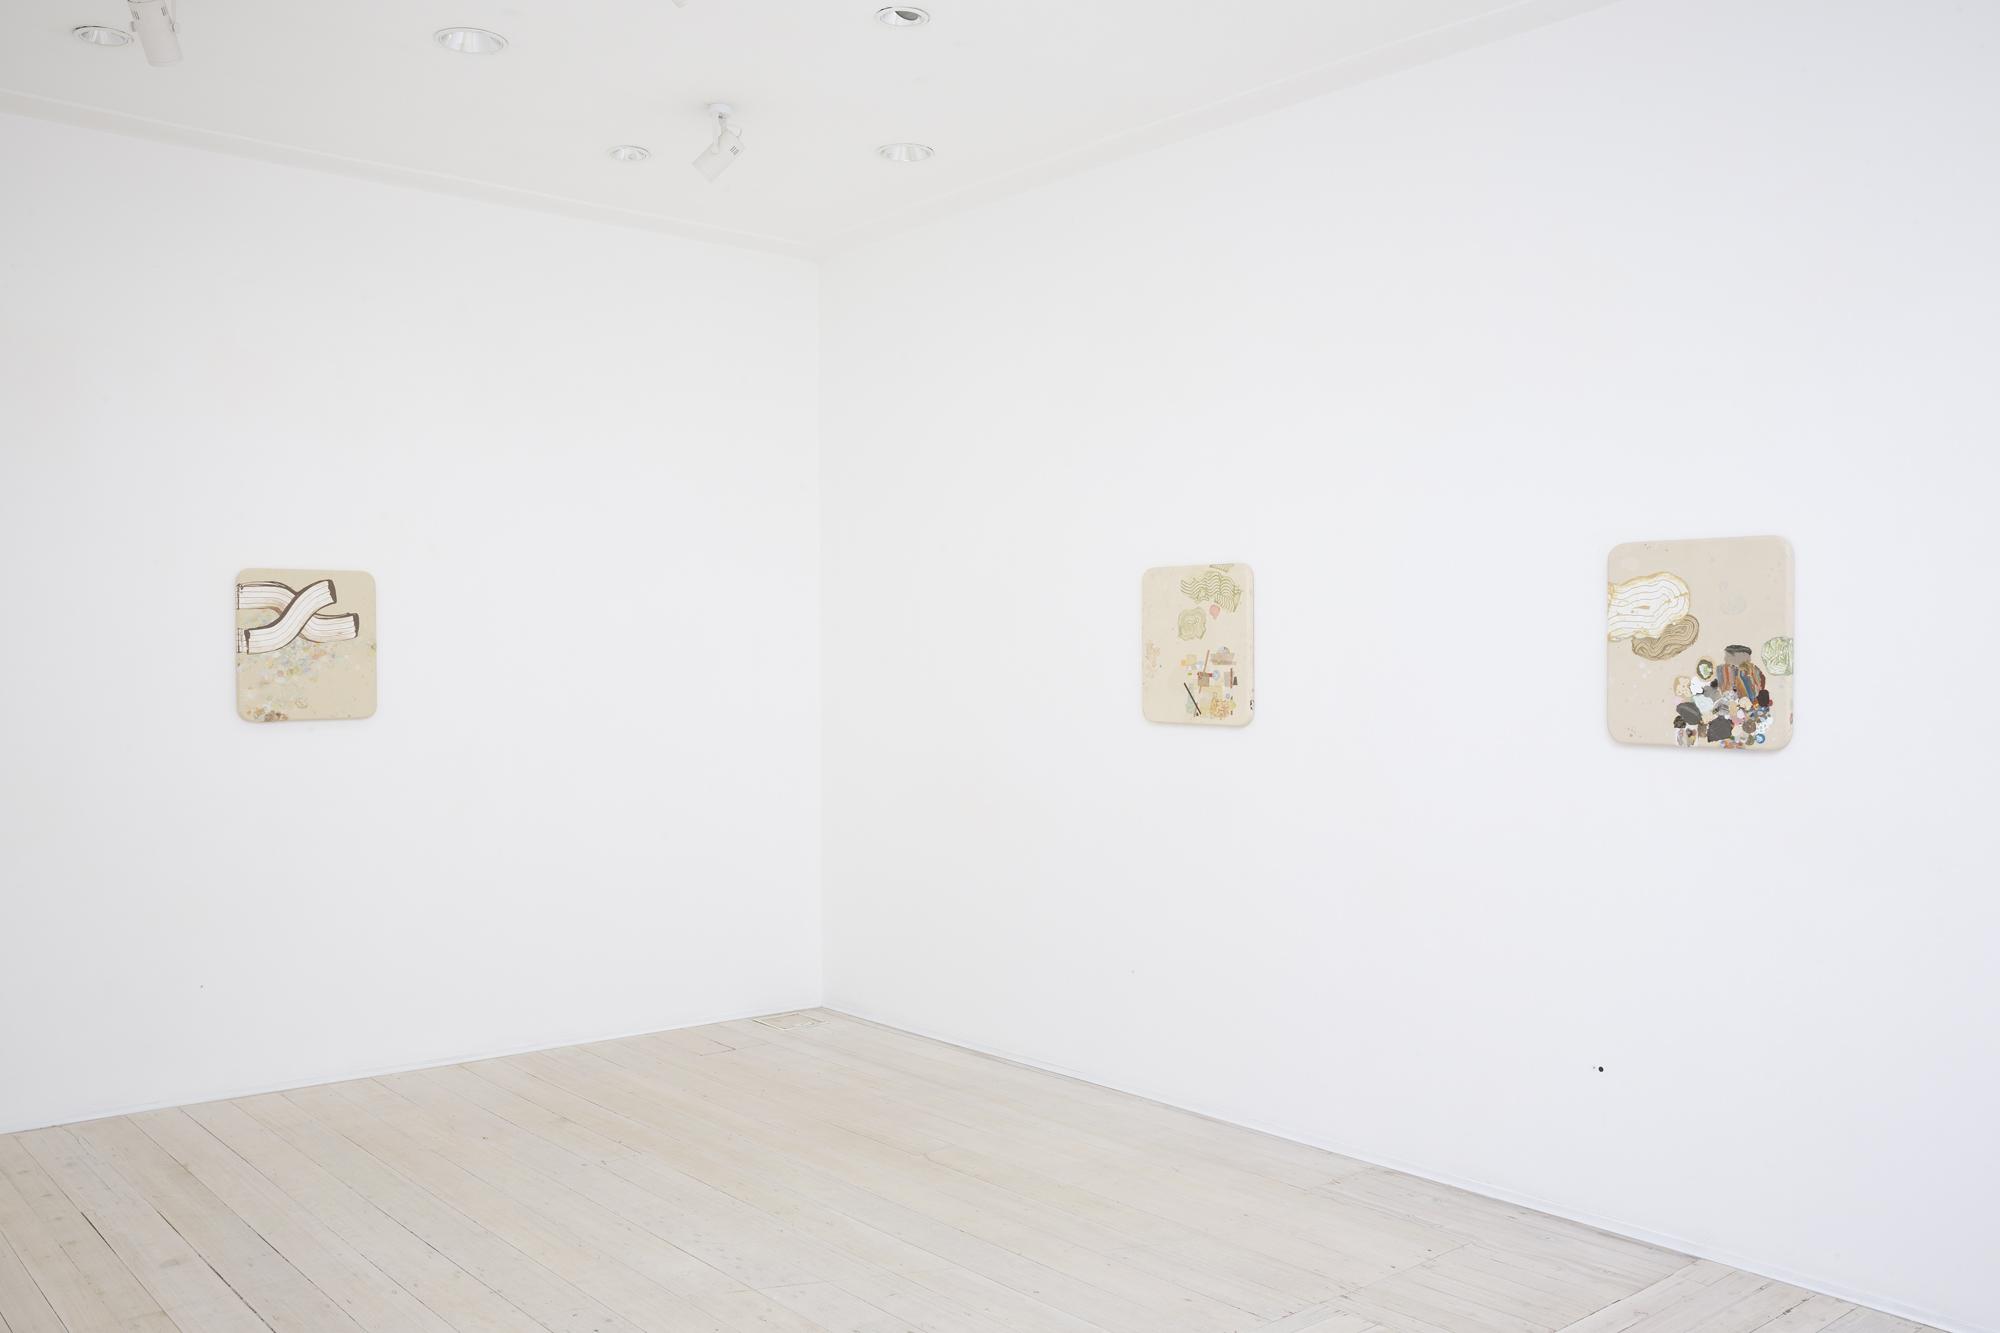 Mark Rodda, artist, exhibition, gallery 9